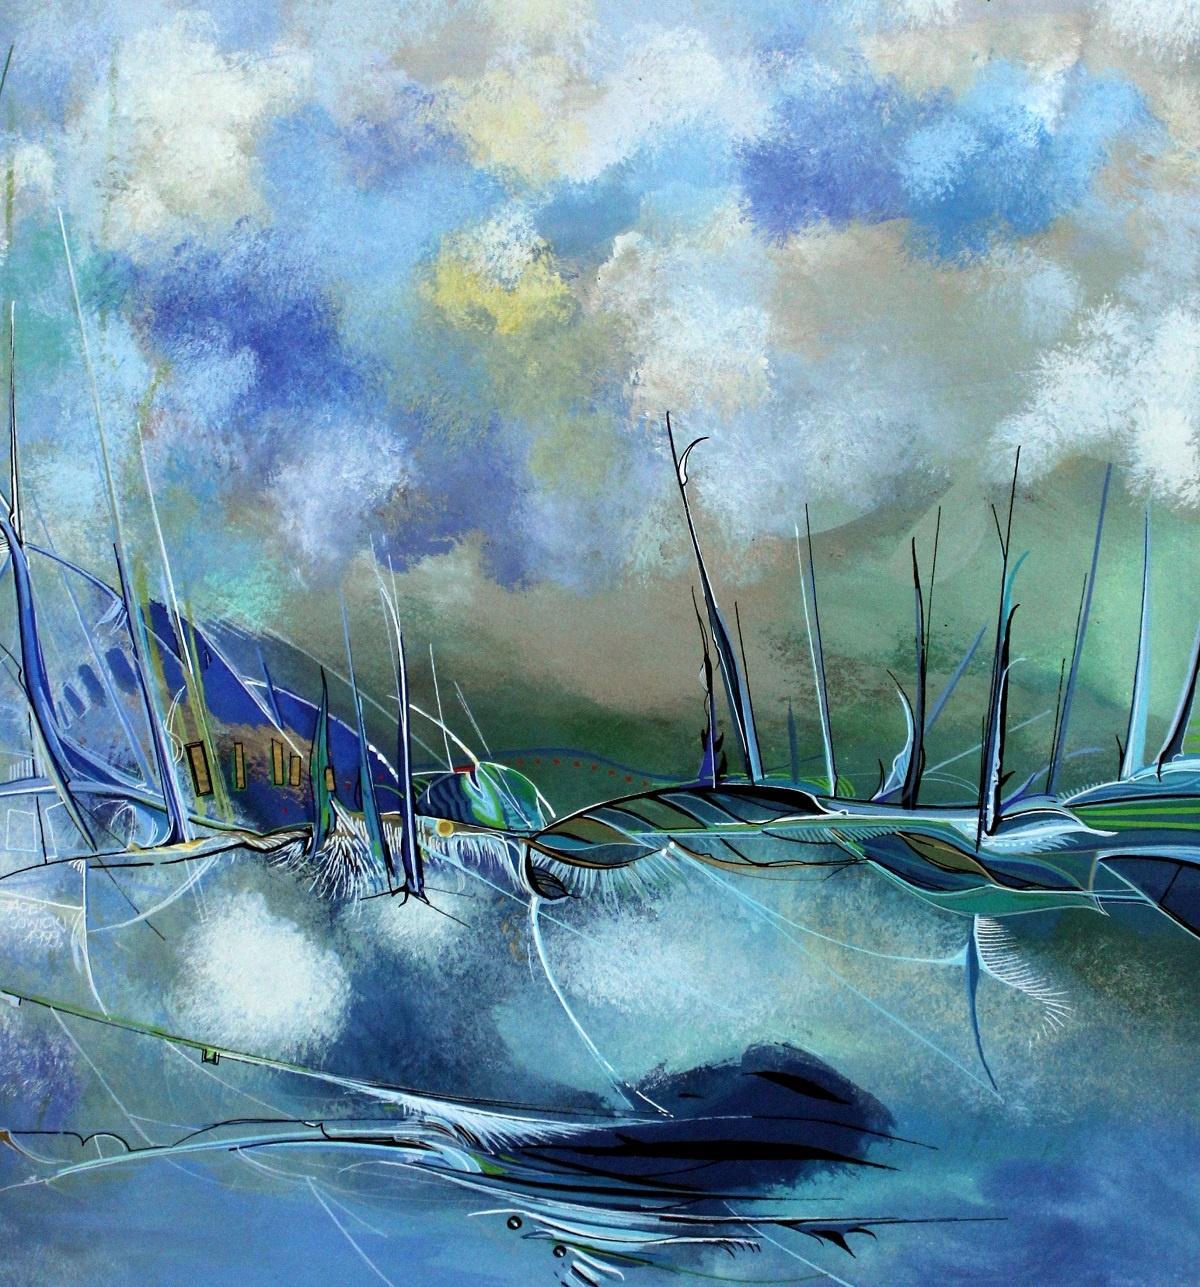 A Postcard - XXI century, Contemporary Gouache Painting, Abstraction, Landscape